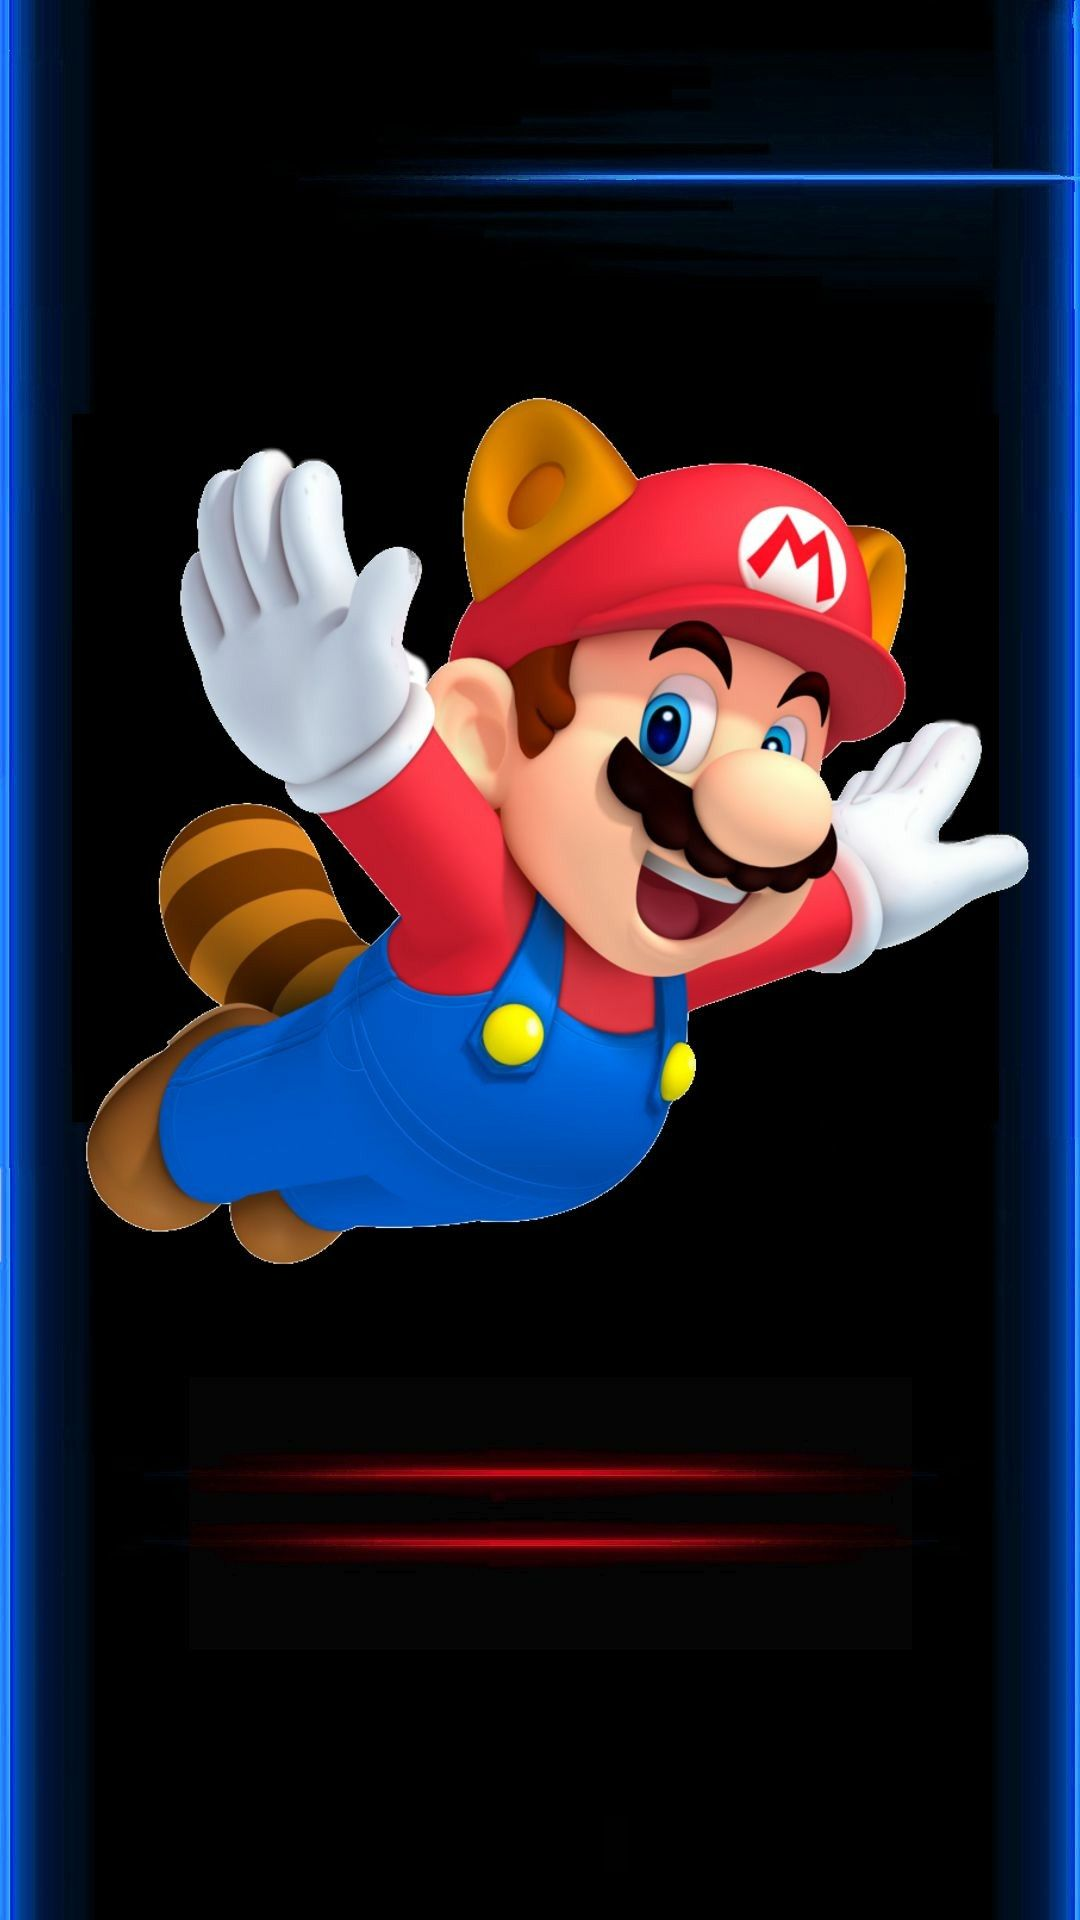 Repetirse sabor dulce deuda  Pin de yenyenTV en Mario and Luigi | Dibujos de mario, Fondo de juego,  Wallpaper nintendo